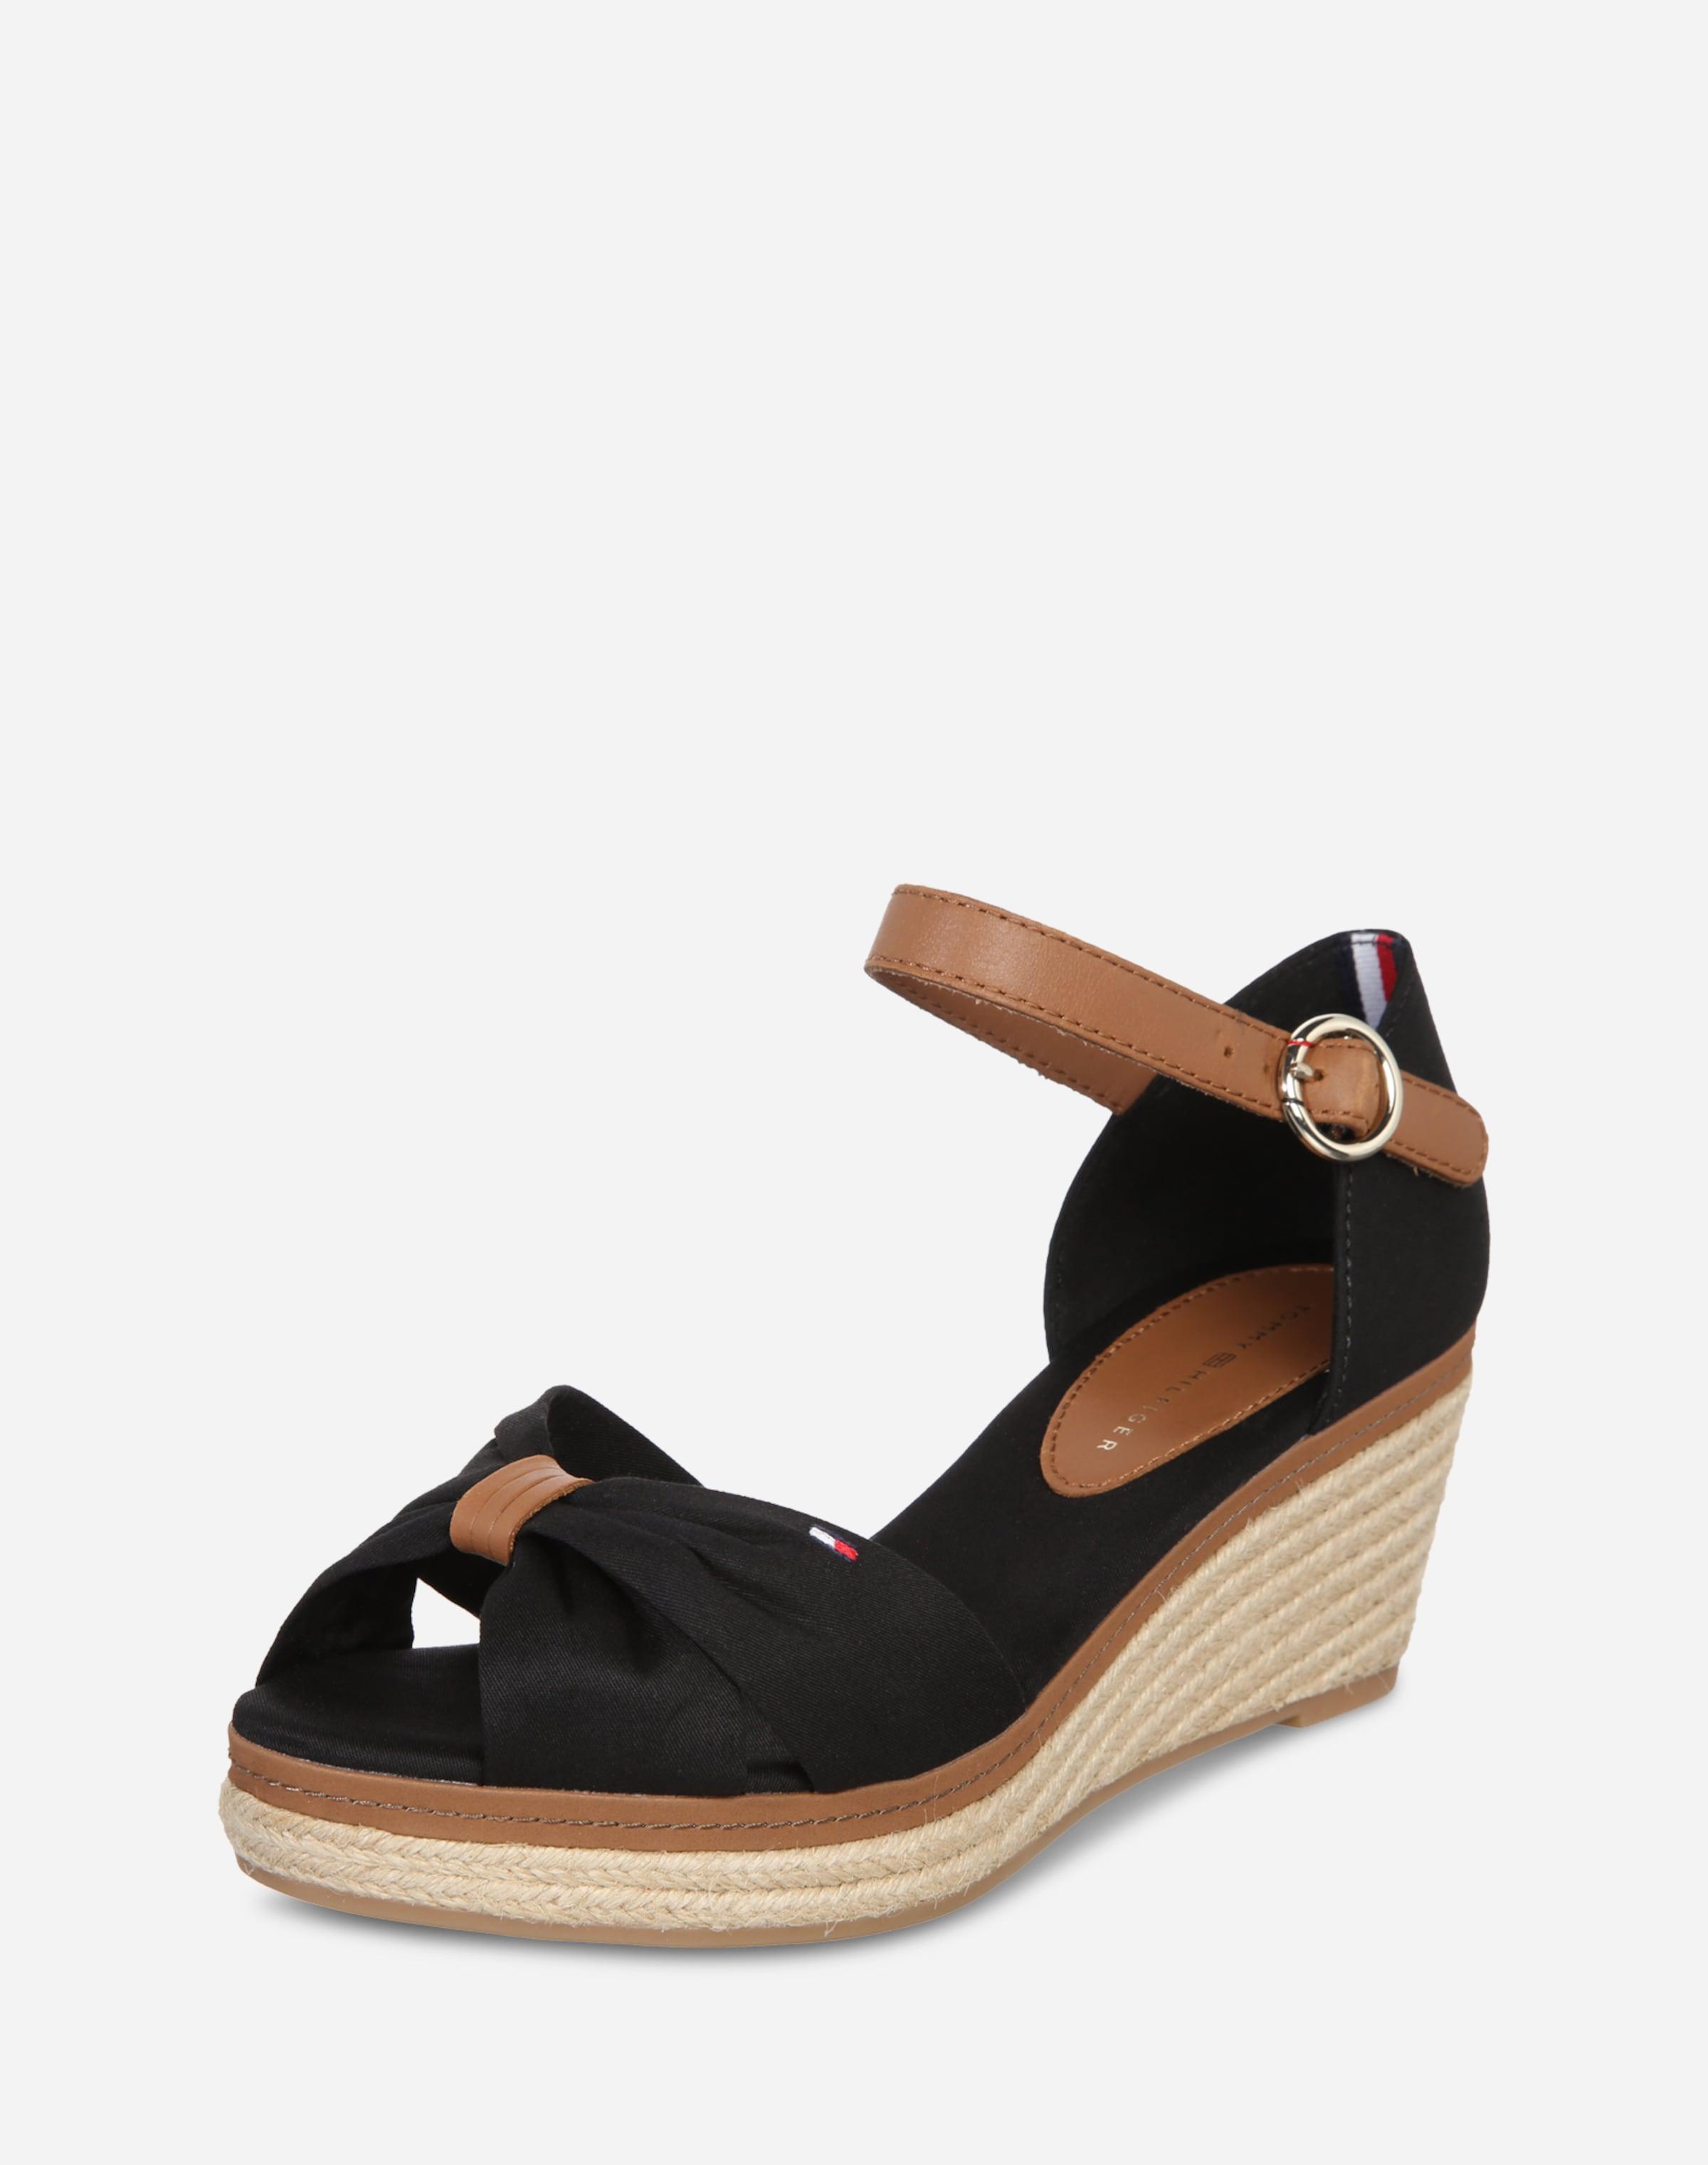 Haltbare Mode billige Schuhe TOMMY HILFIGER   Keilsandale 'Elba' Schuhe Gut getragene Schuhe